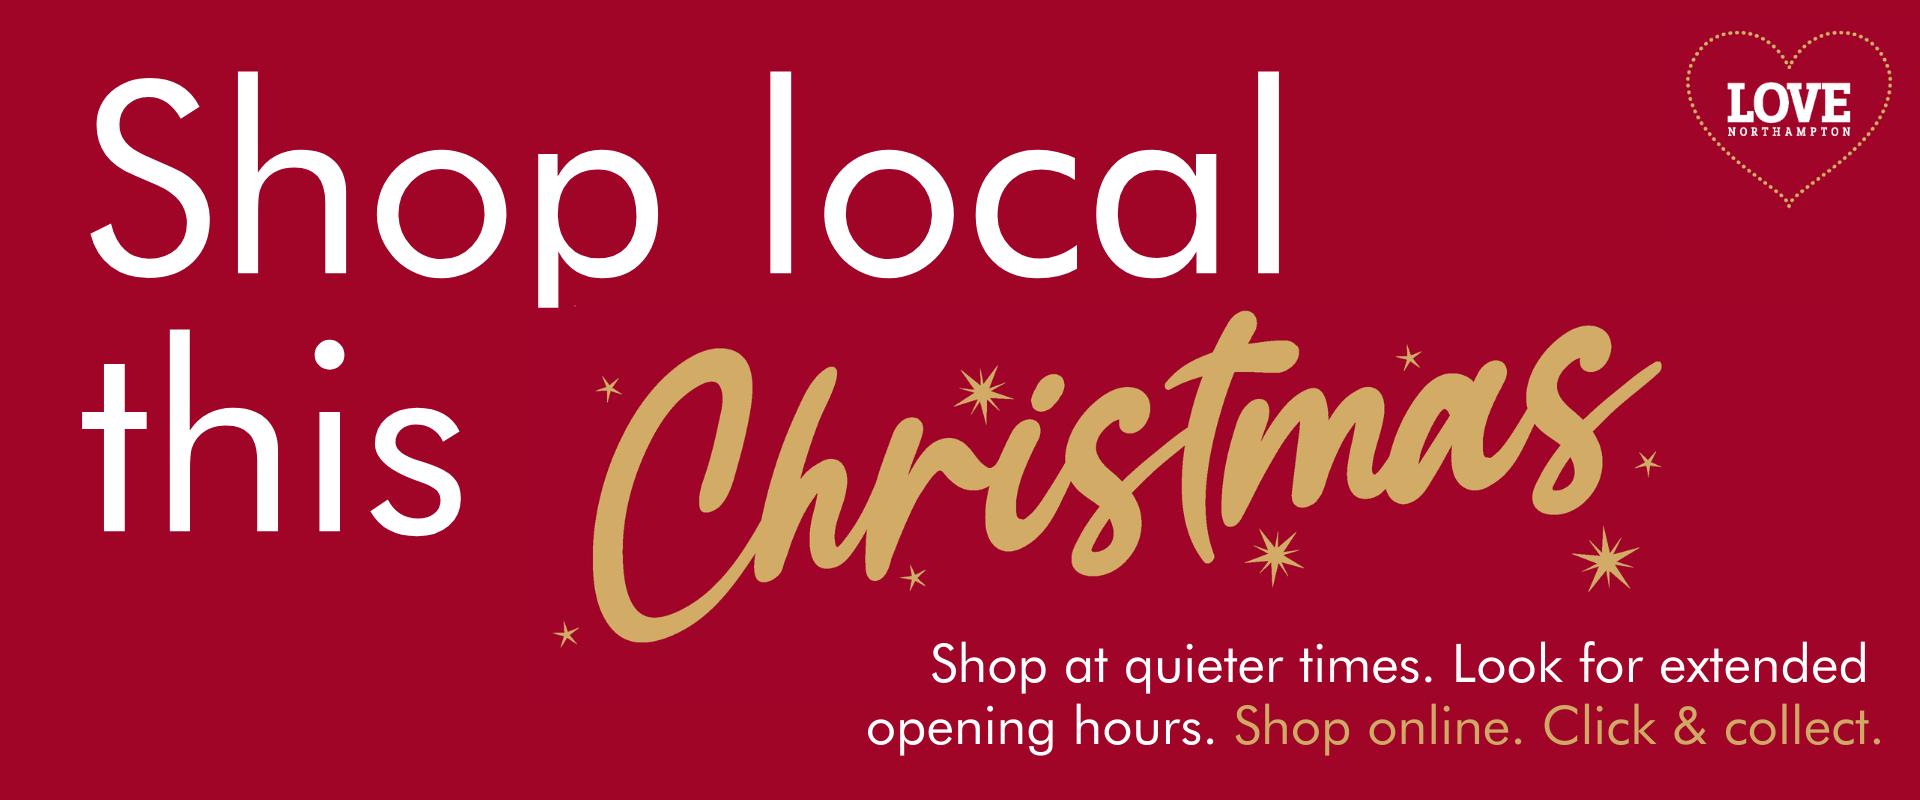 Shop local - Love northampton banner